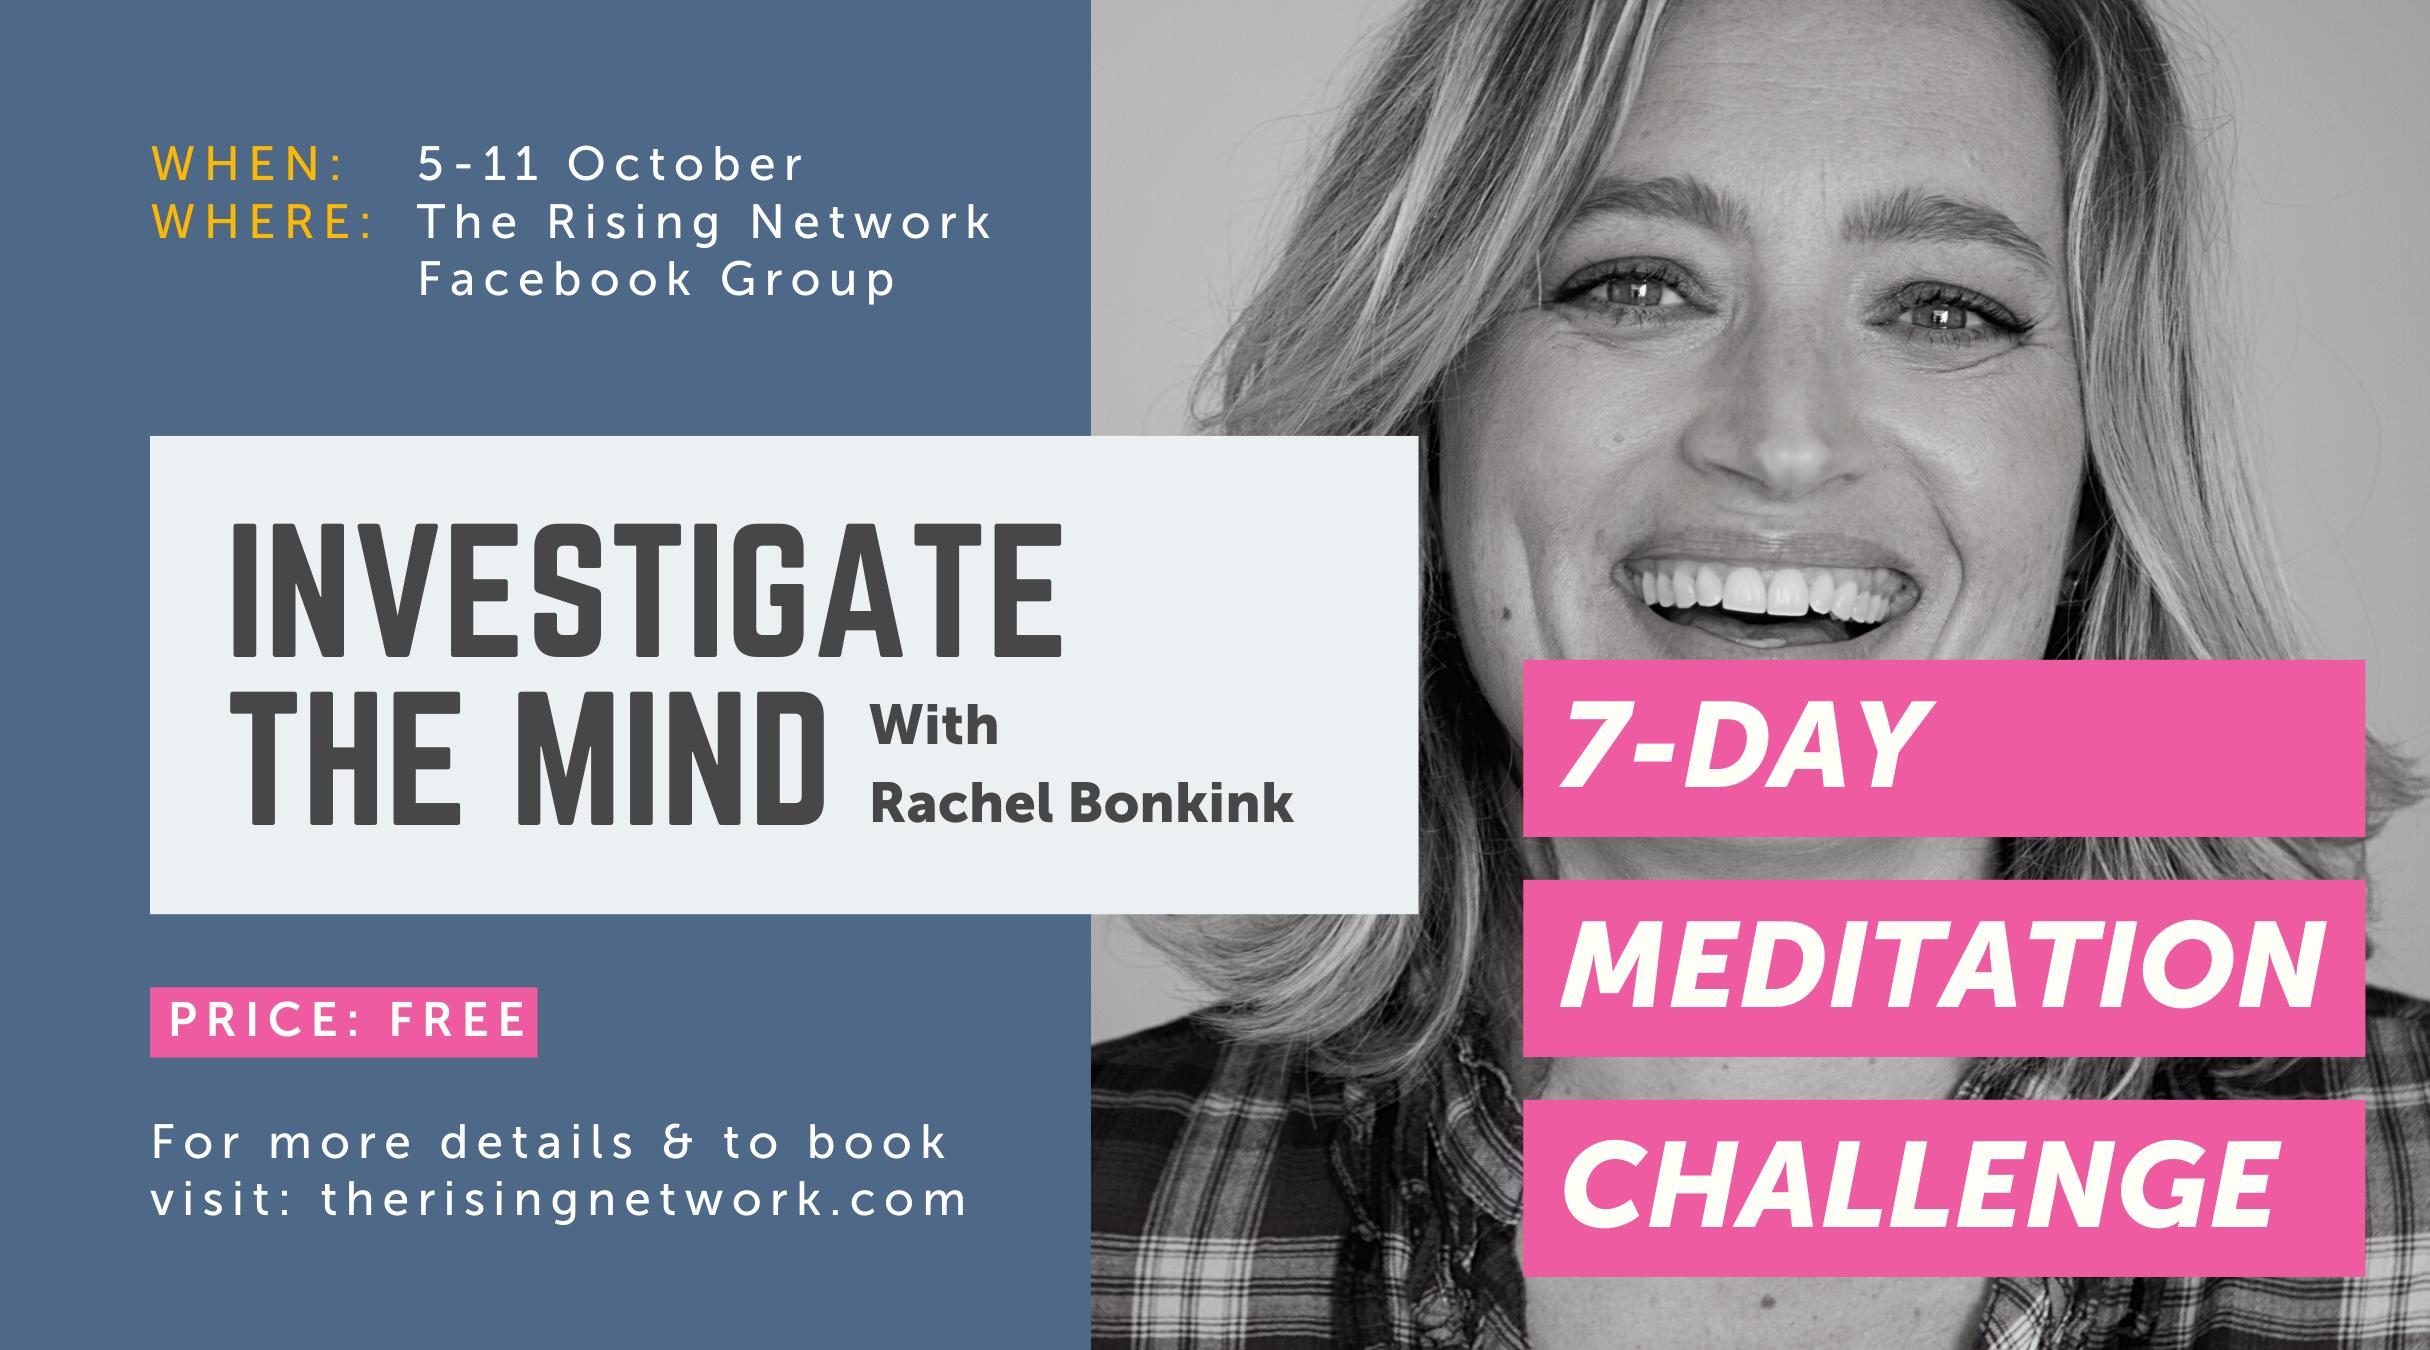 Investigate the mind Rachel Bonkink